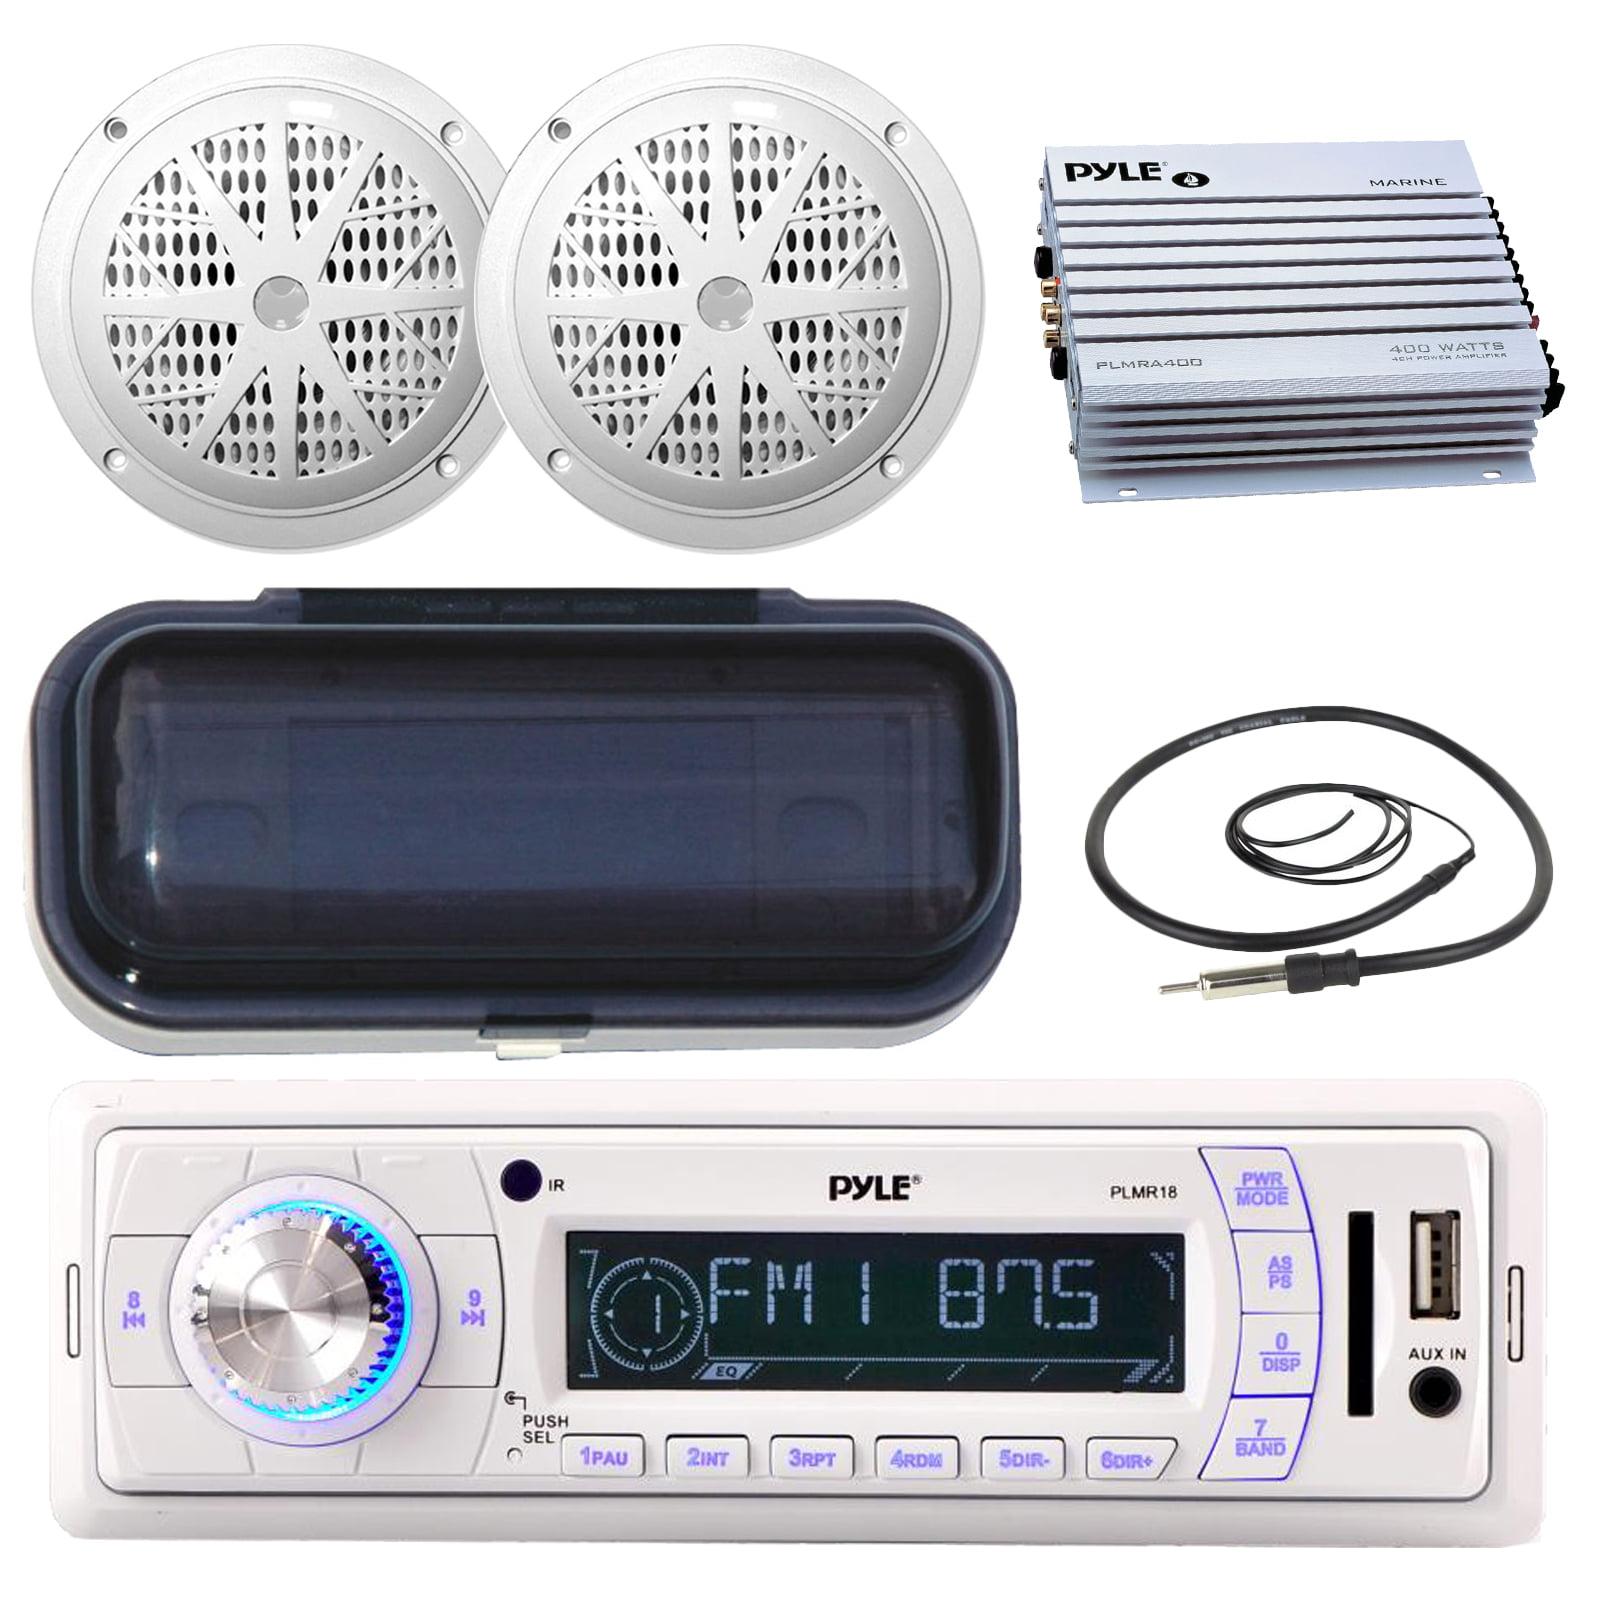 Pyle PLMR18 200-Watt Marine AM FM SD USB Aux Remote Radio...